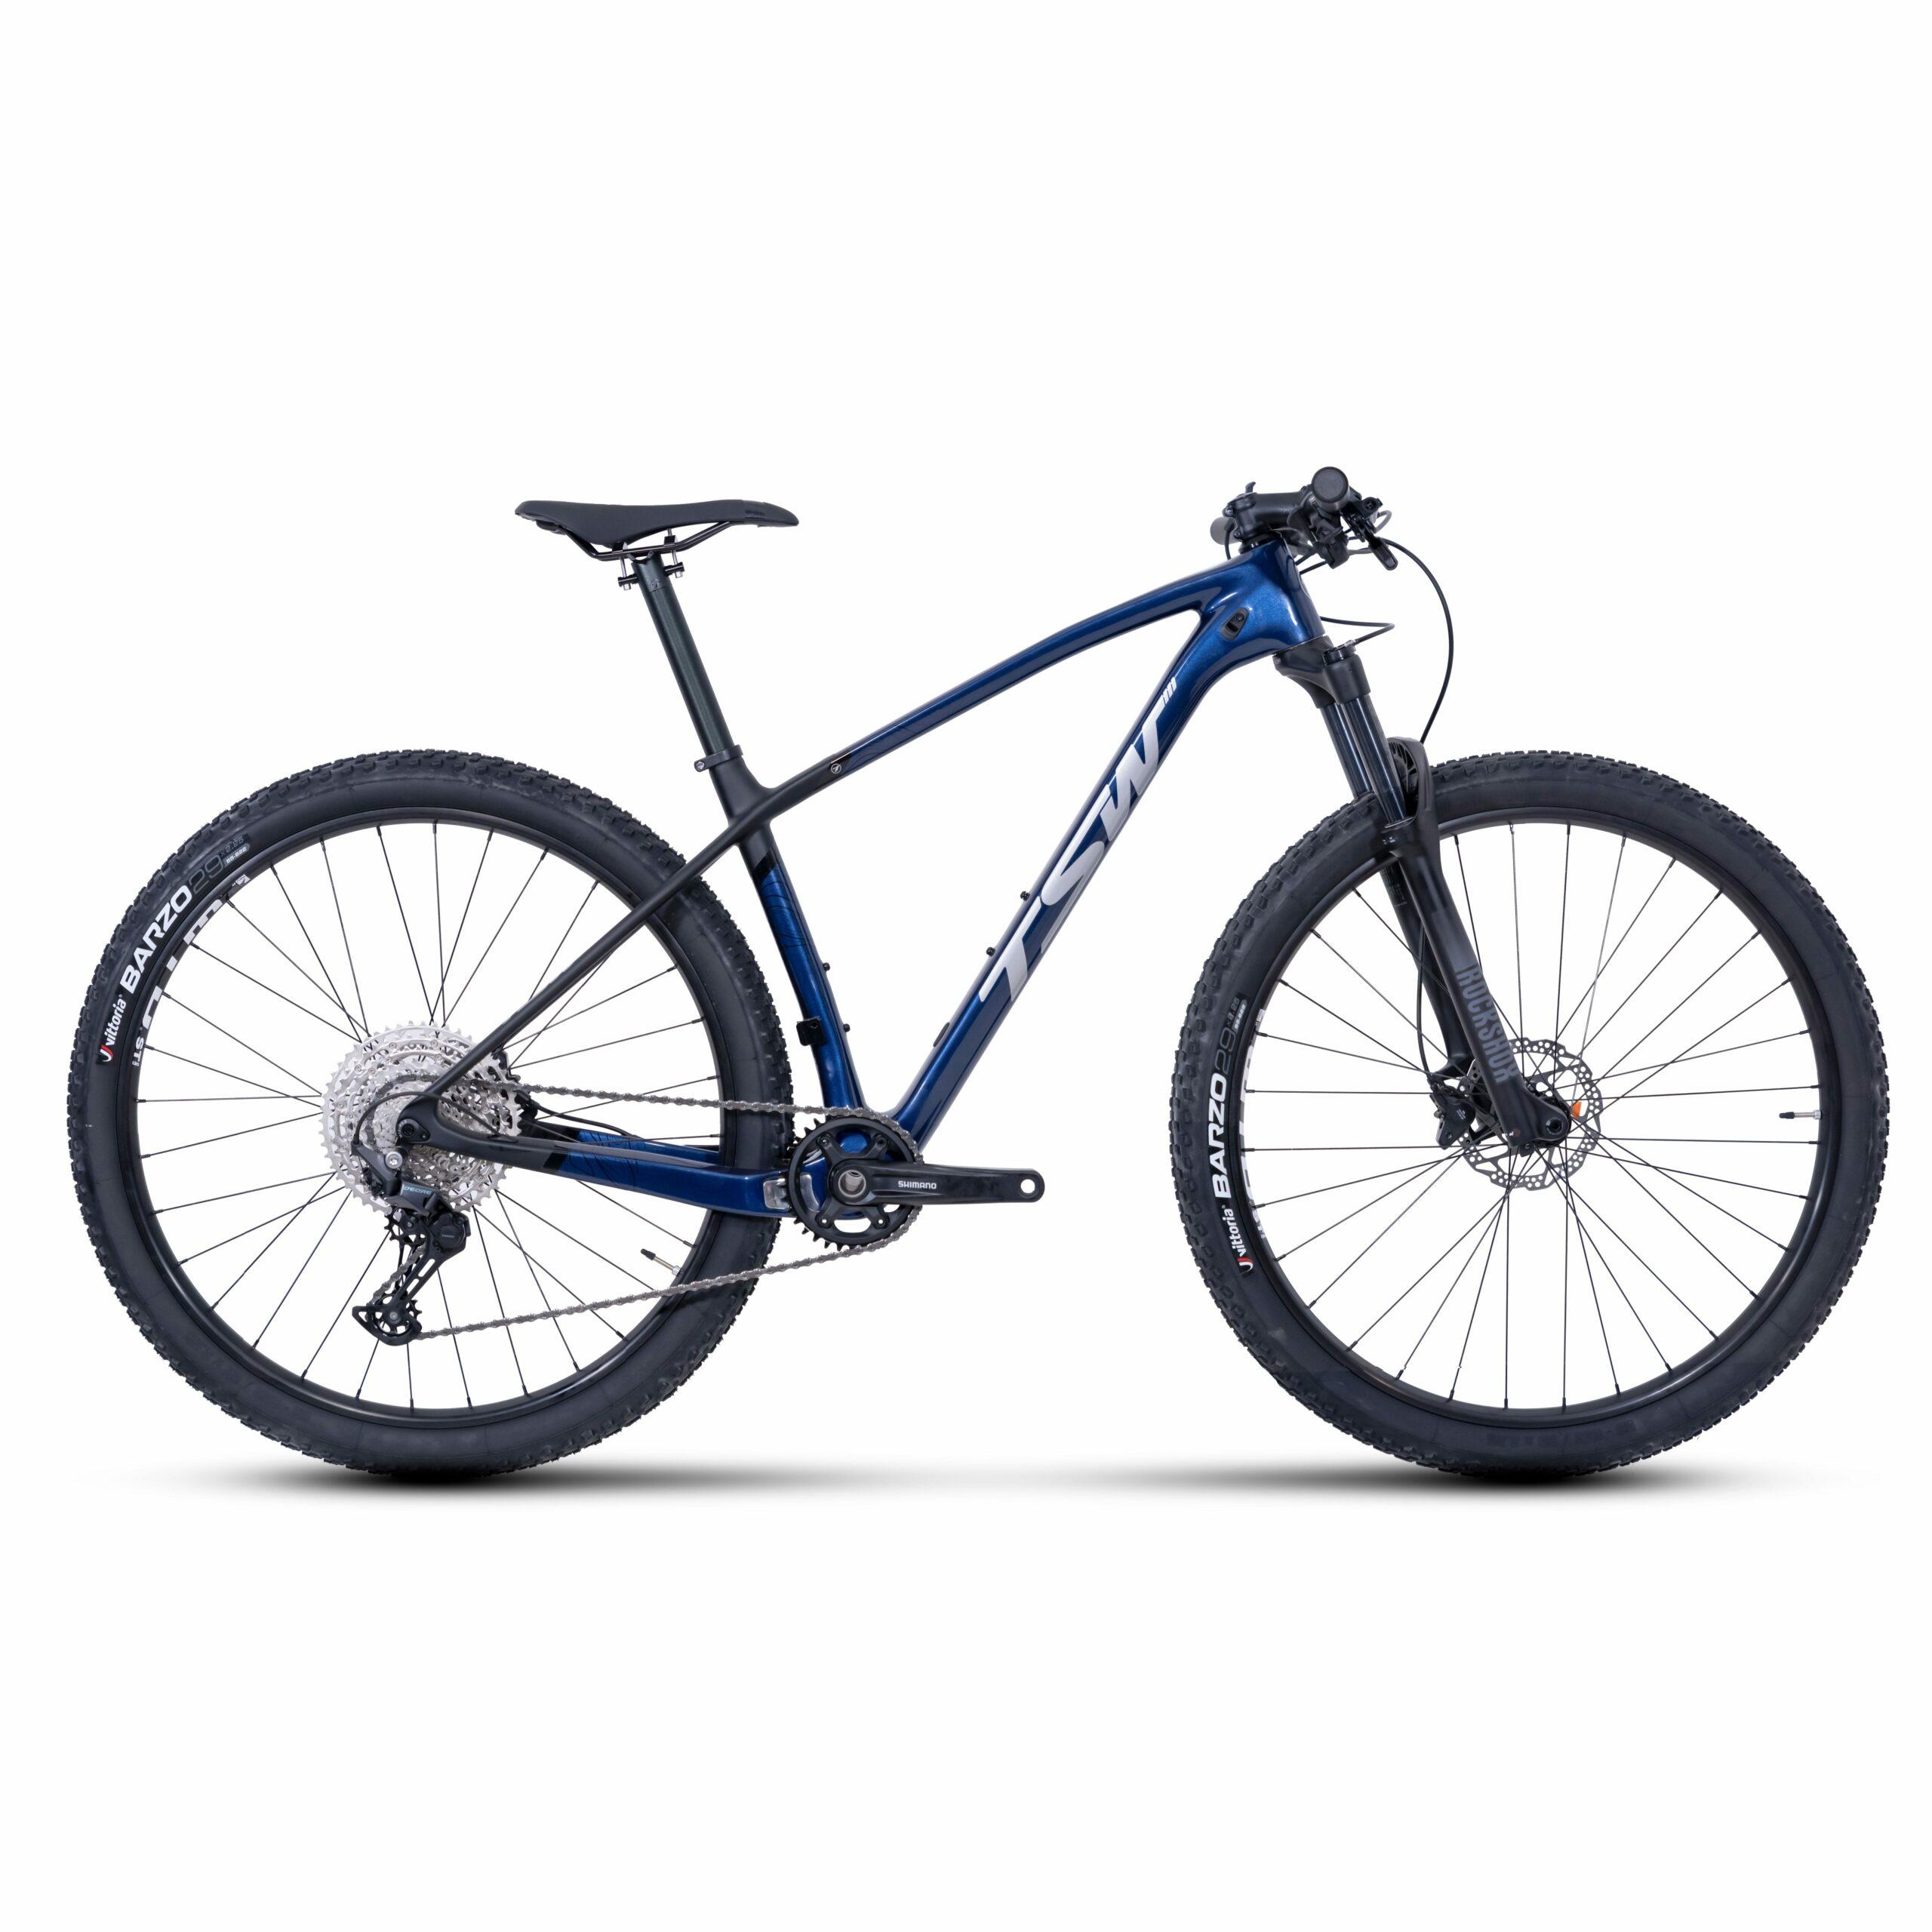 Bicicleta TSW Evo Quest | Starter 5